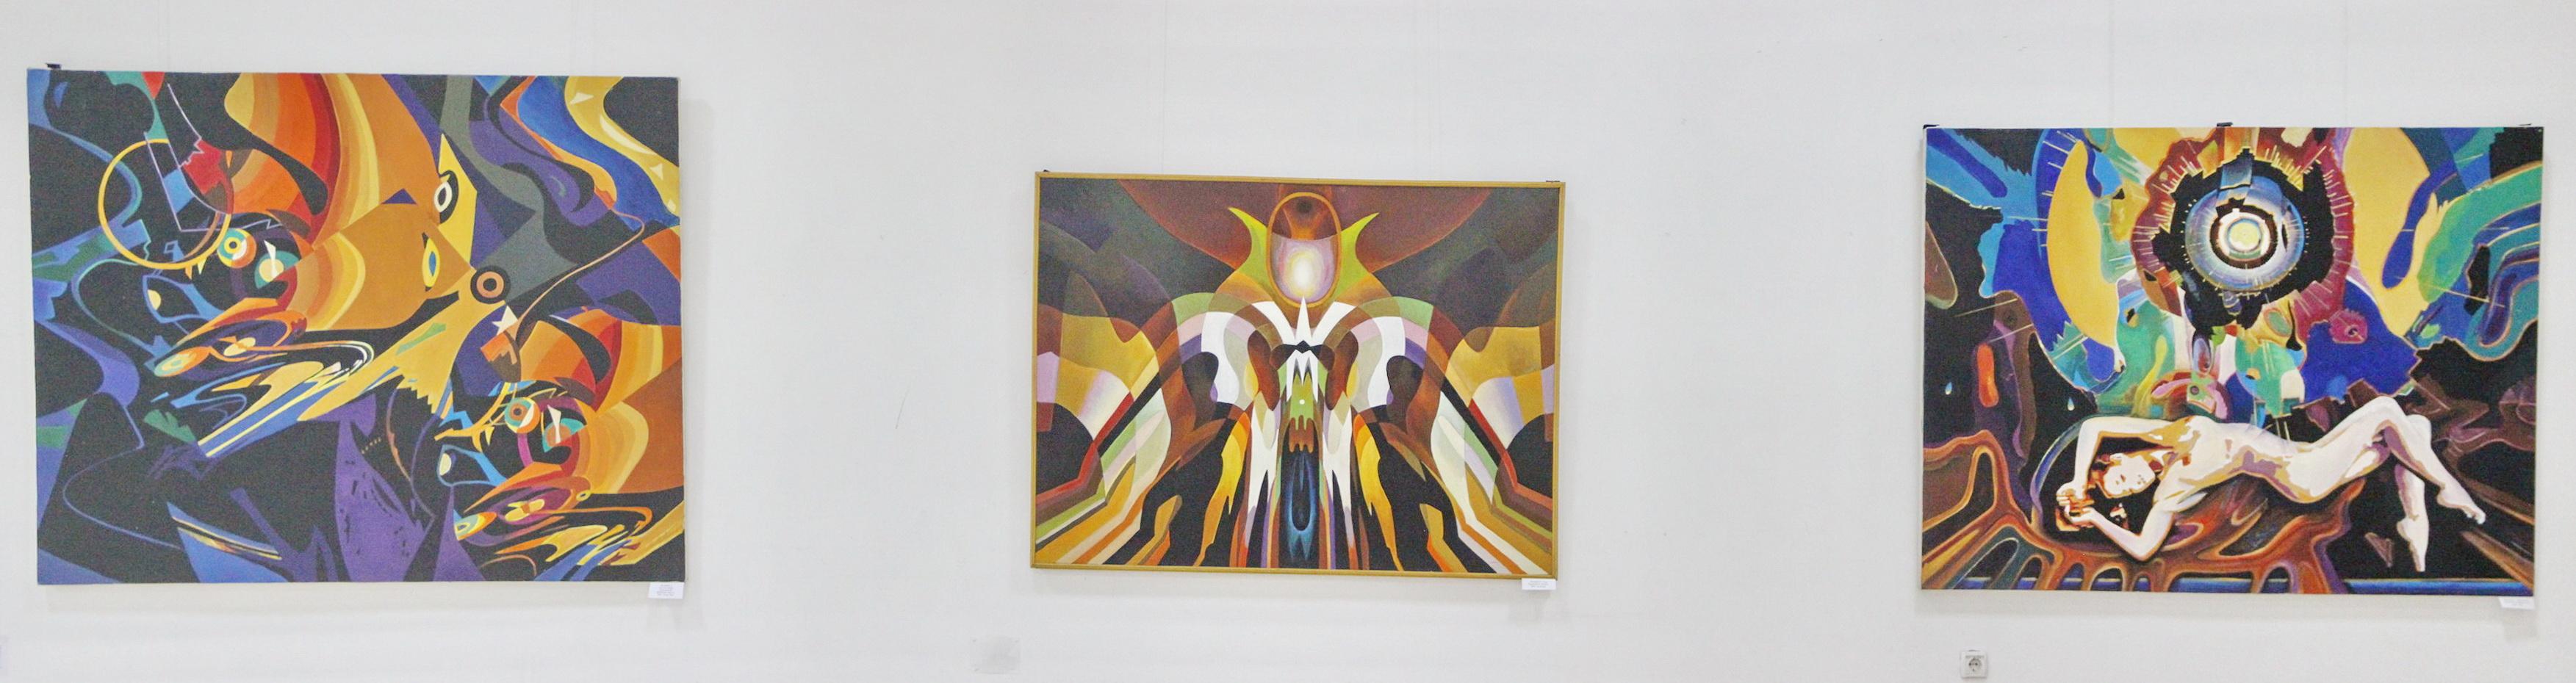 Экспозиция картин Бурмакина В.И.